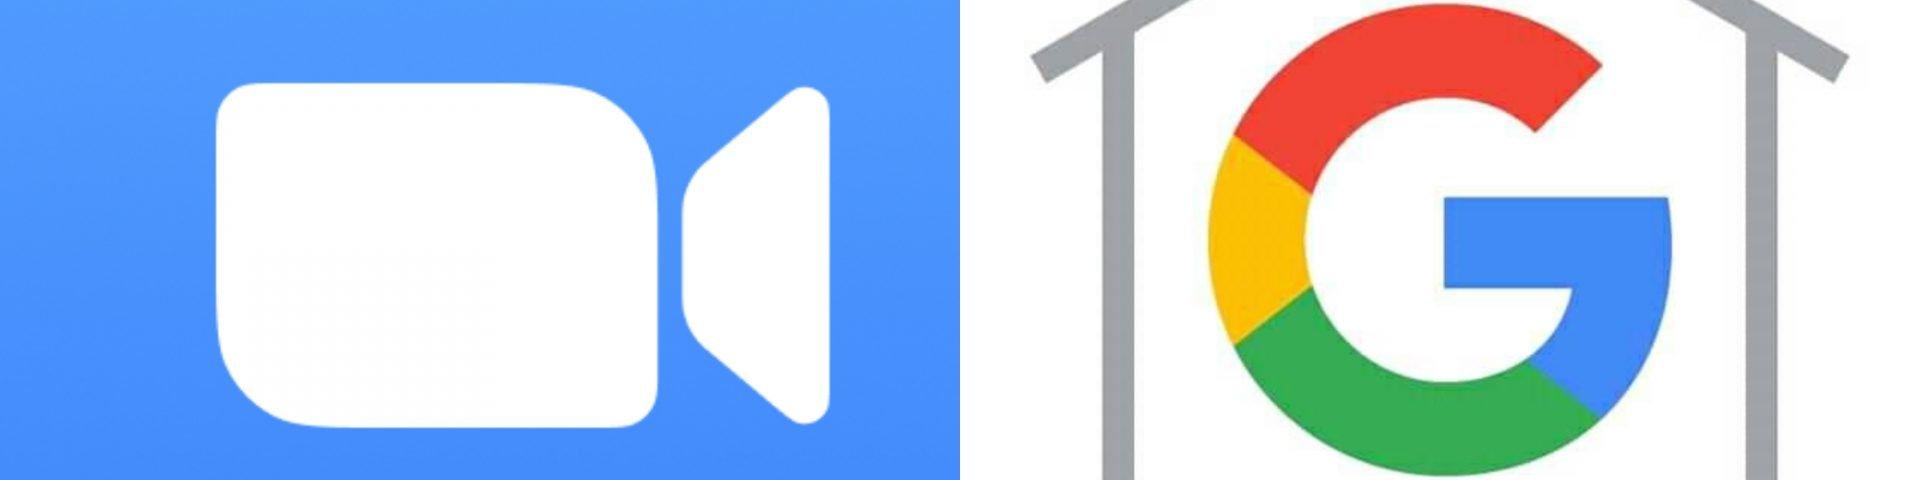 Meglio Google Meet o Zoom? Differenze e analogie